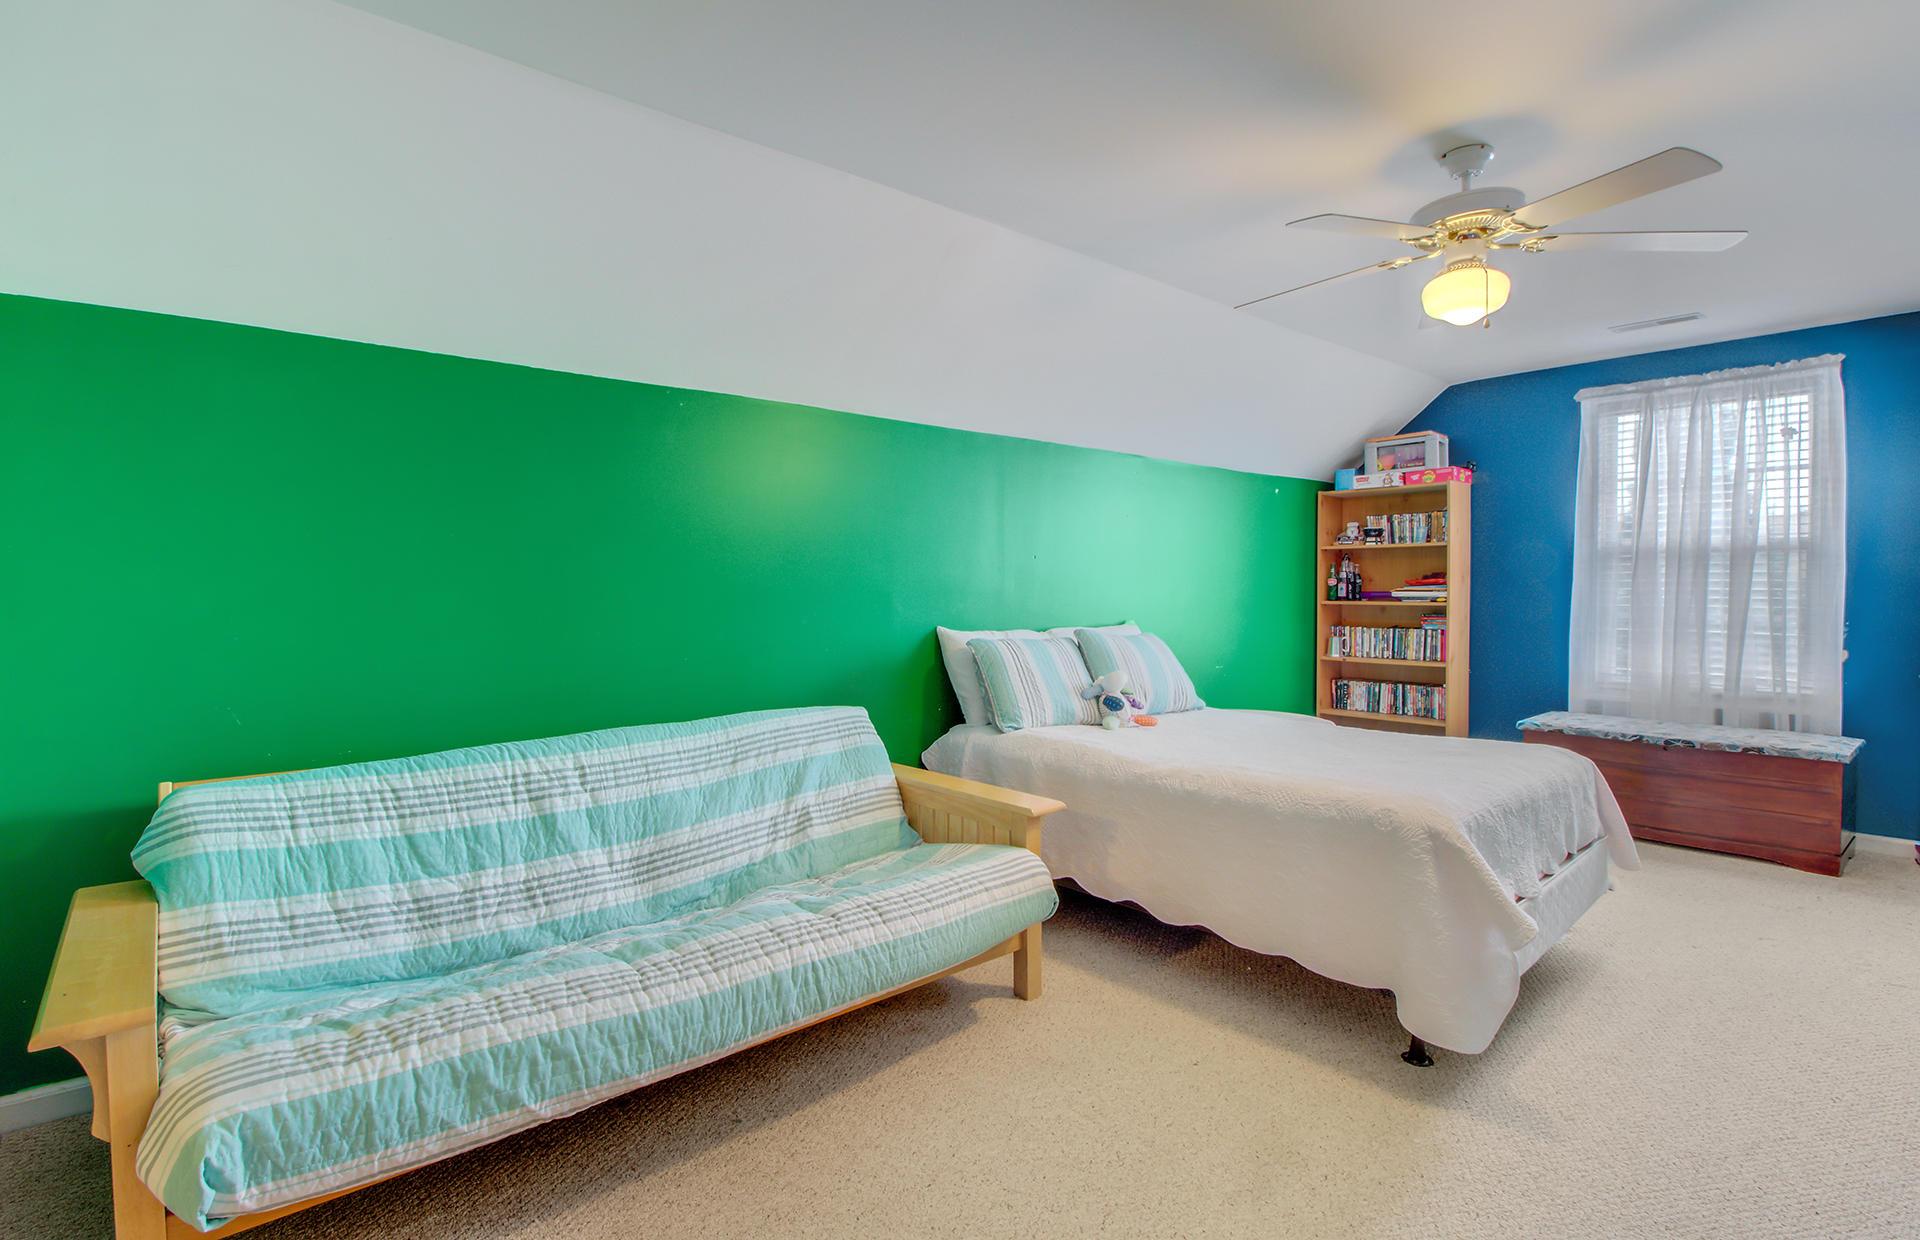 Park West Homes For Sale - 1500 Wellesley, Mount Pleasant, SC - 2